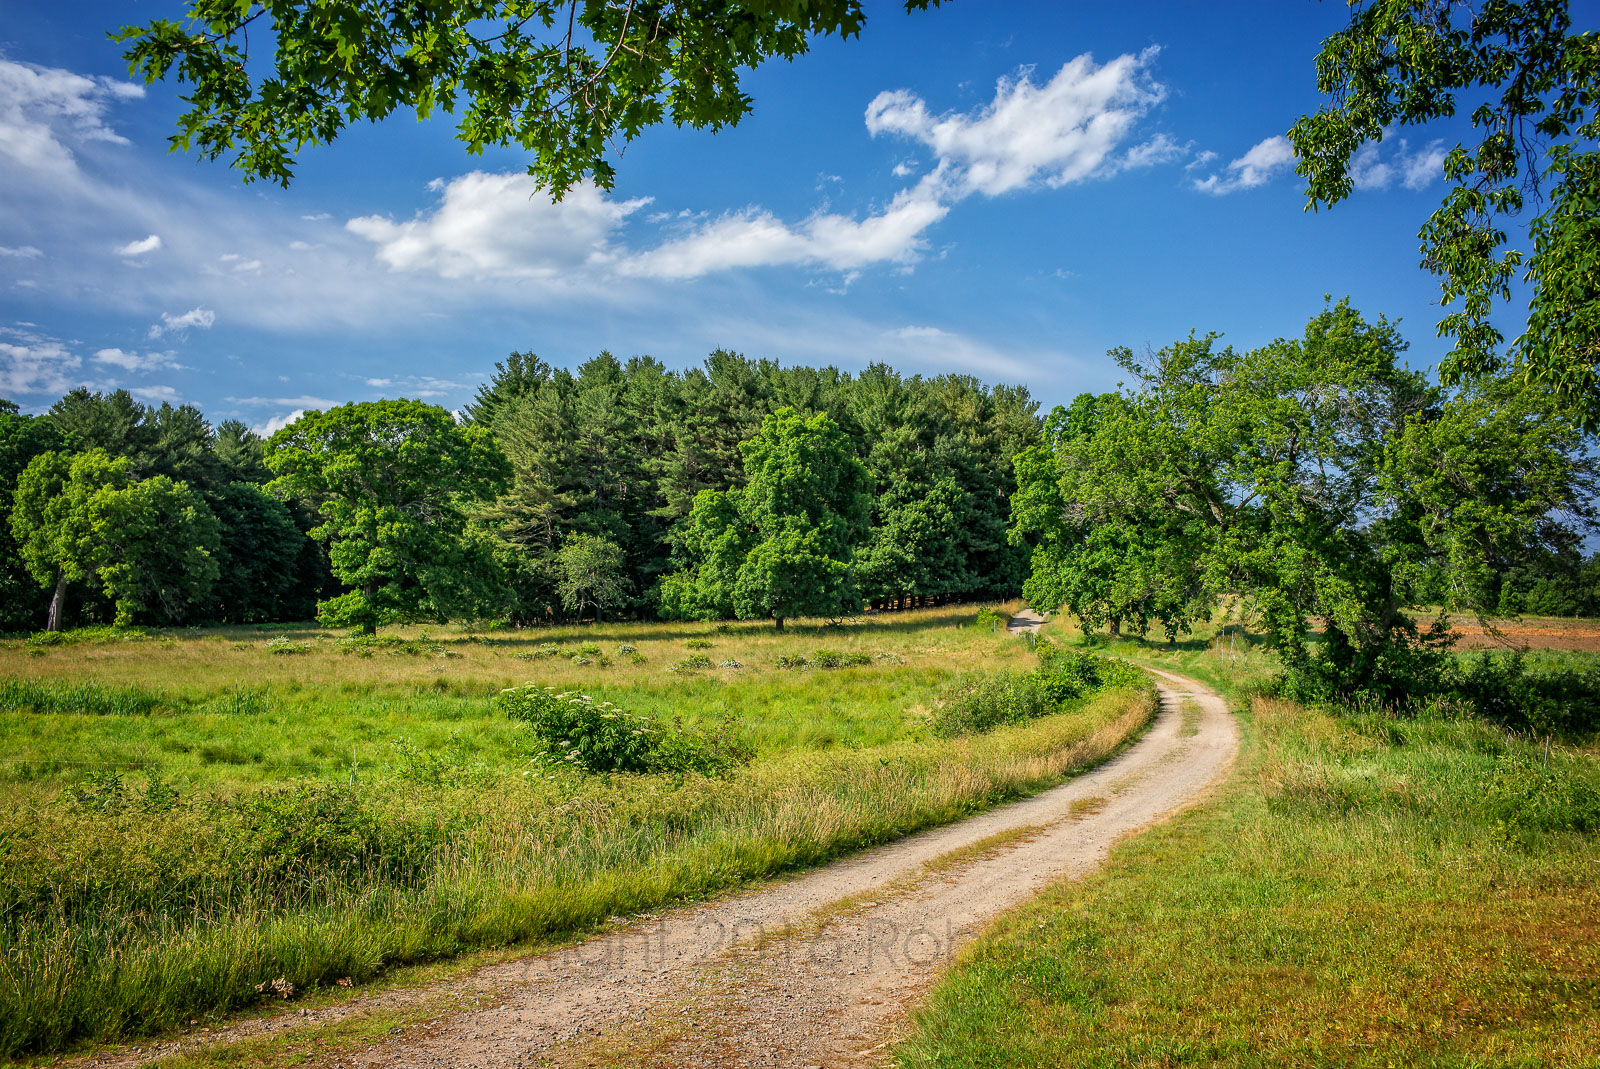 New England, scenic, Ipswich, Landscape, dirt road